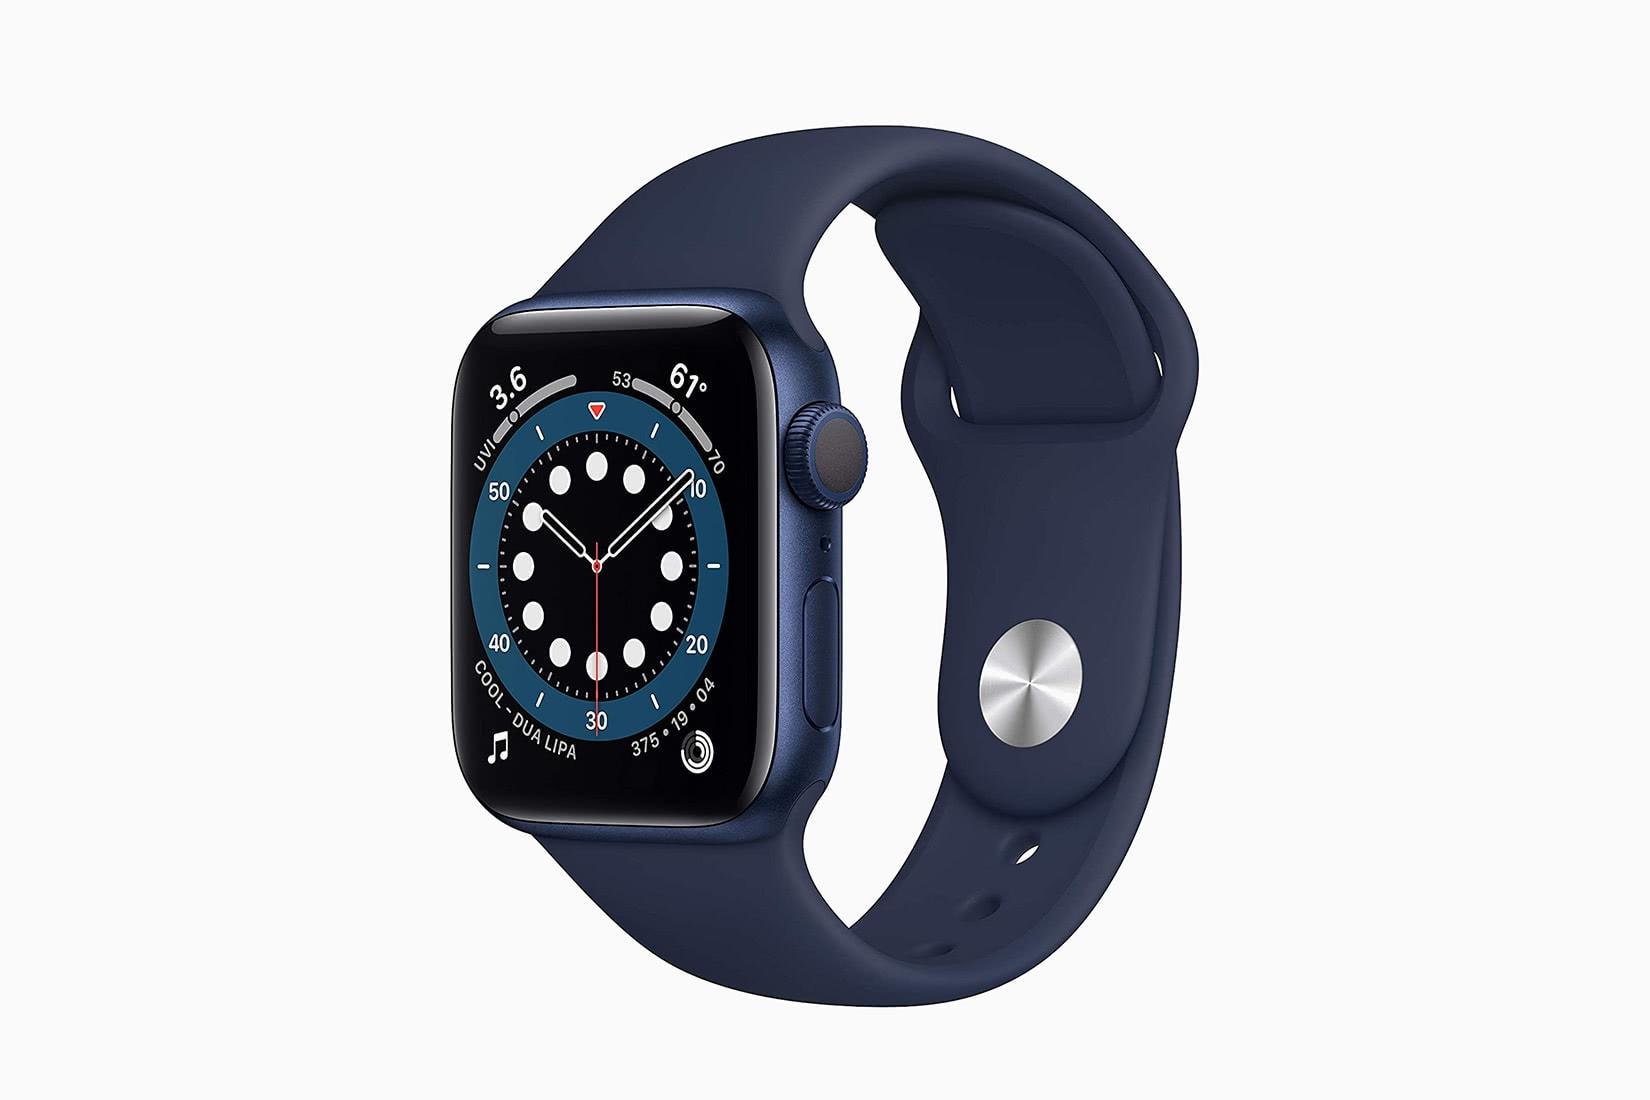 best men watches apple watch series 6 review - Luxe Digital